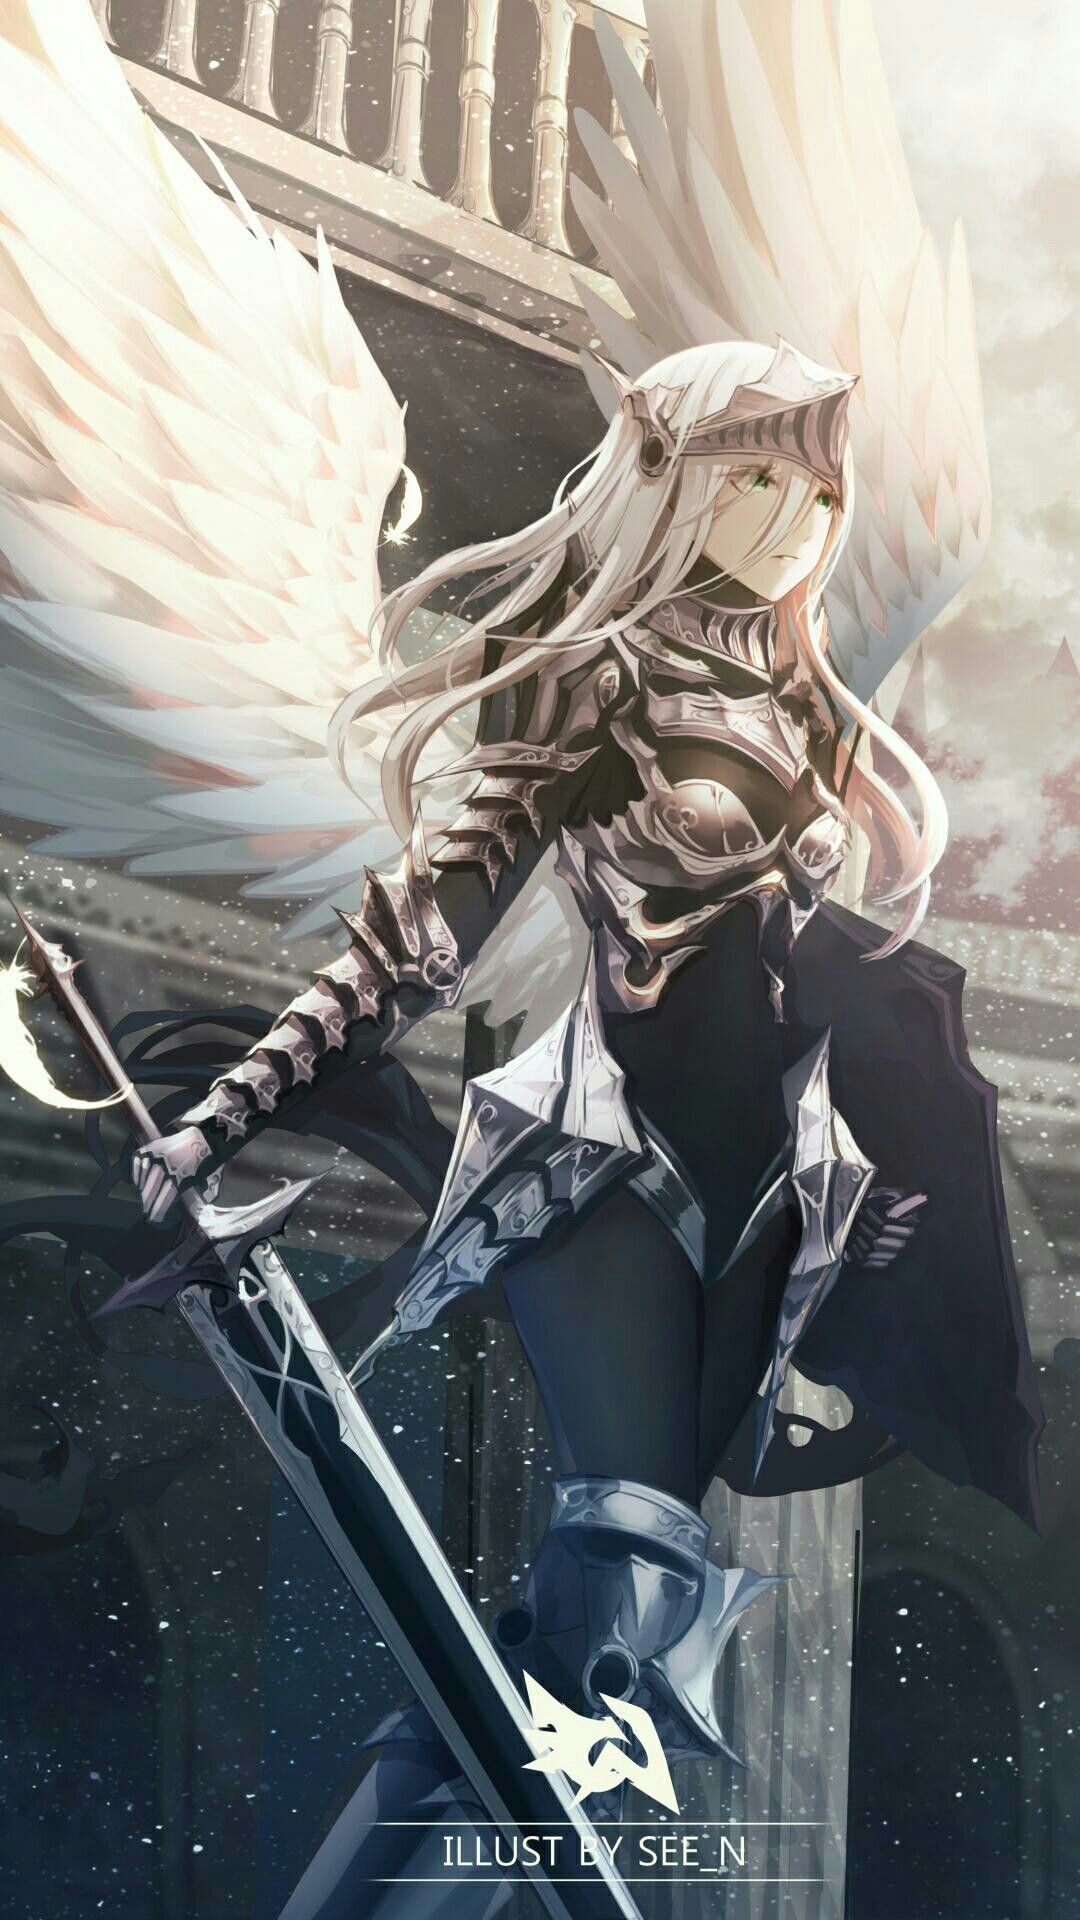 Photo of The Goddess hero (Bnha x Fairy Tail!Oc)